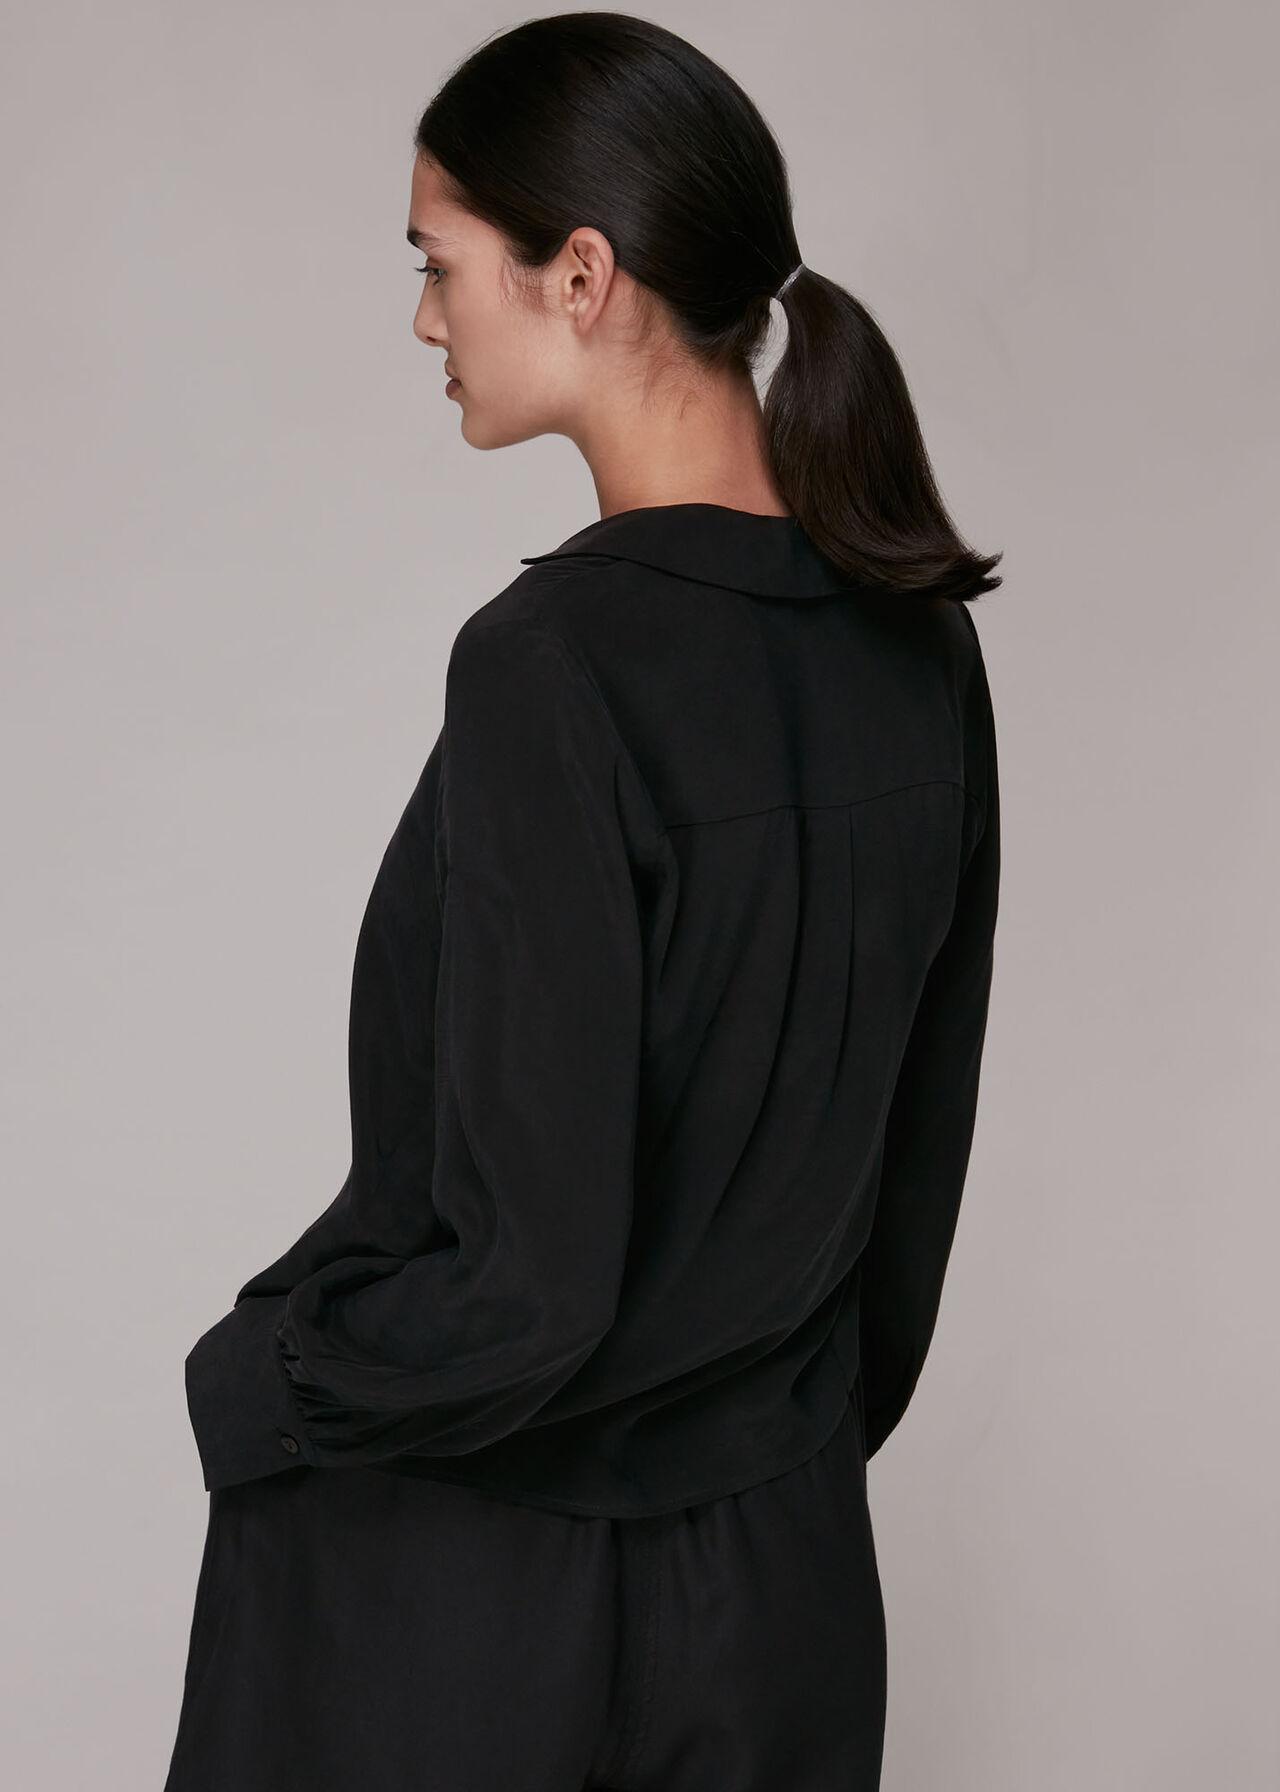 Melodie V Neck Shirt